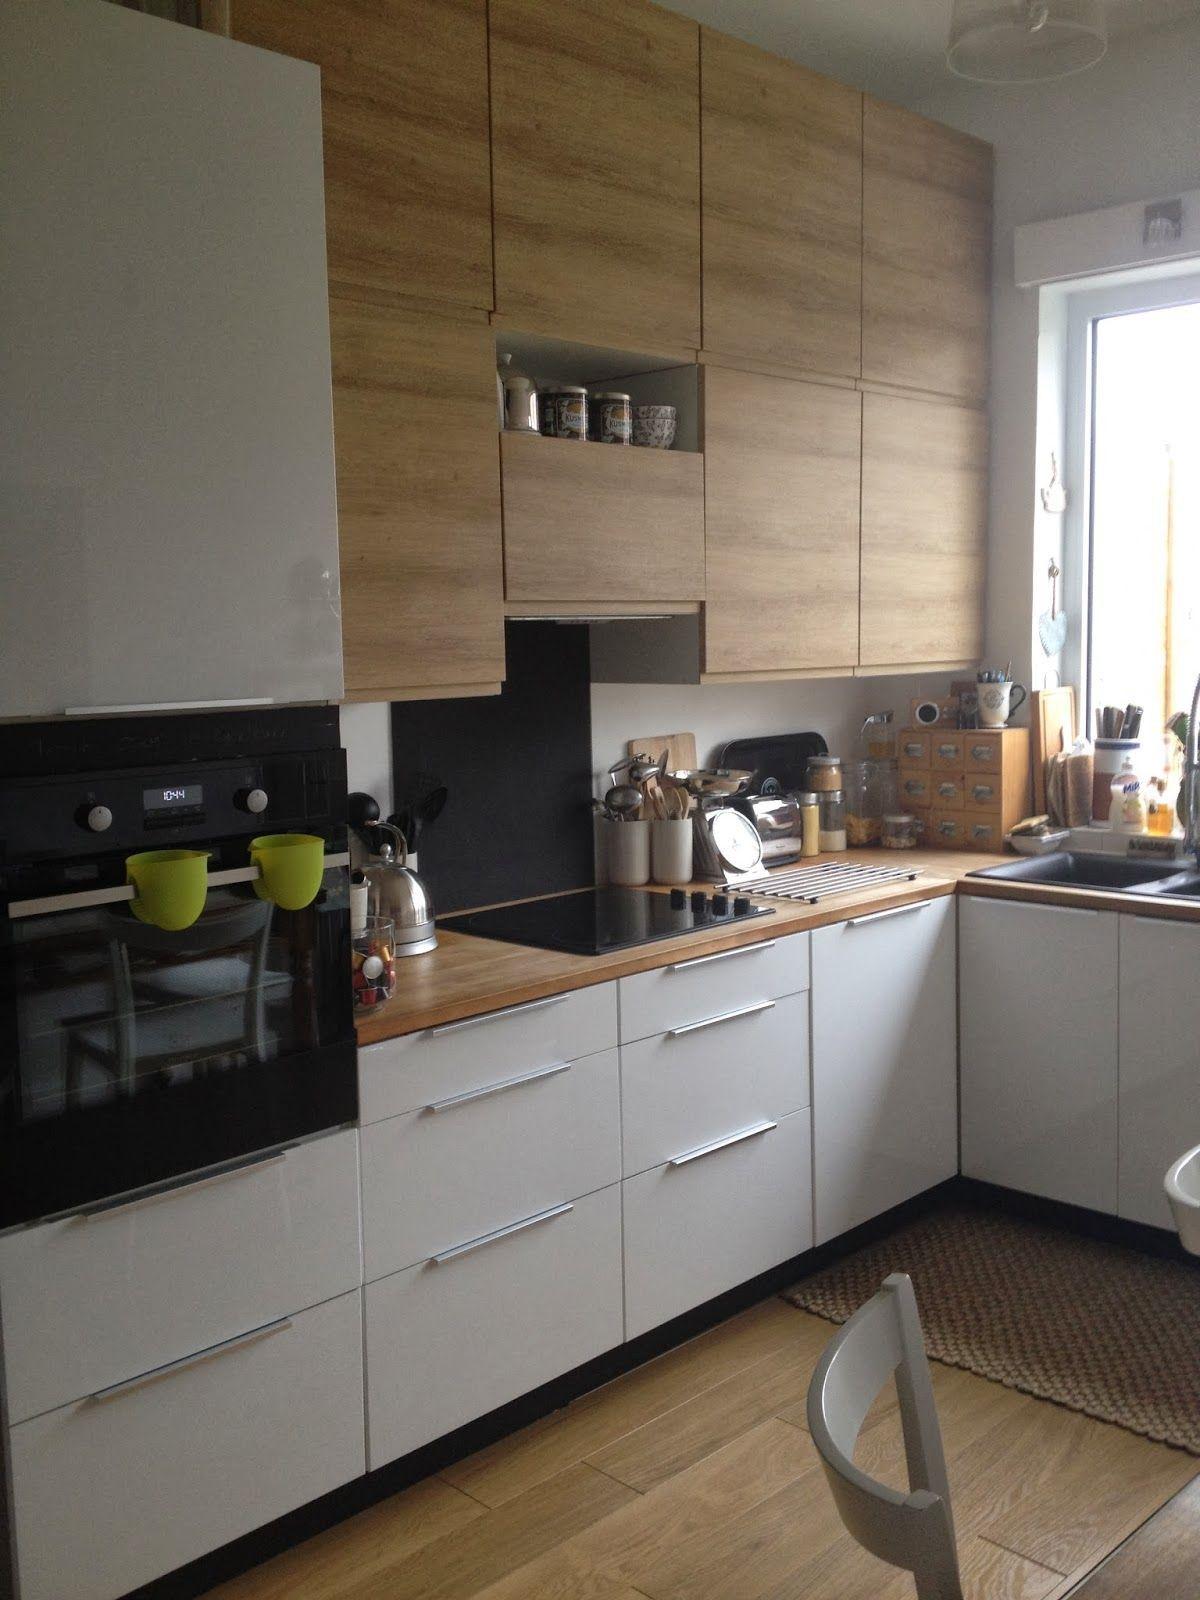 Fresh Ma Cuisine Leroy Merlin Kitchen Remodel Small Interior Design Kitchen Home Kitchens